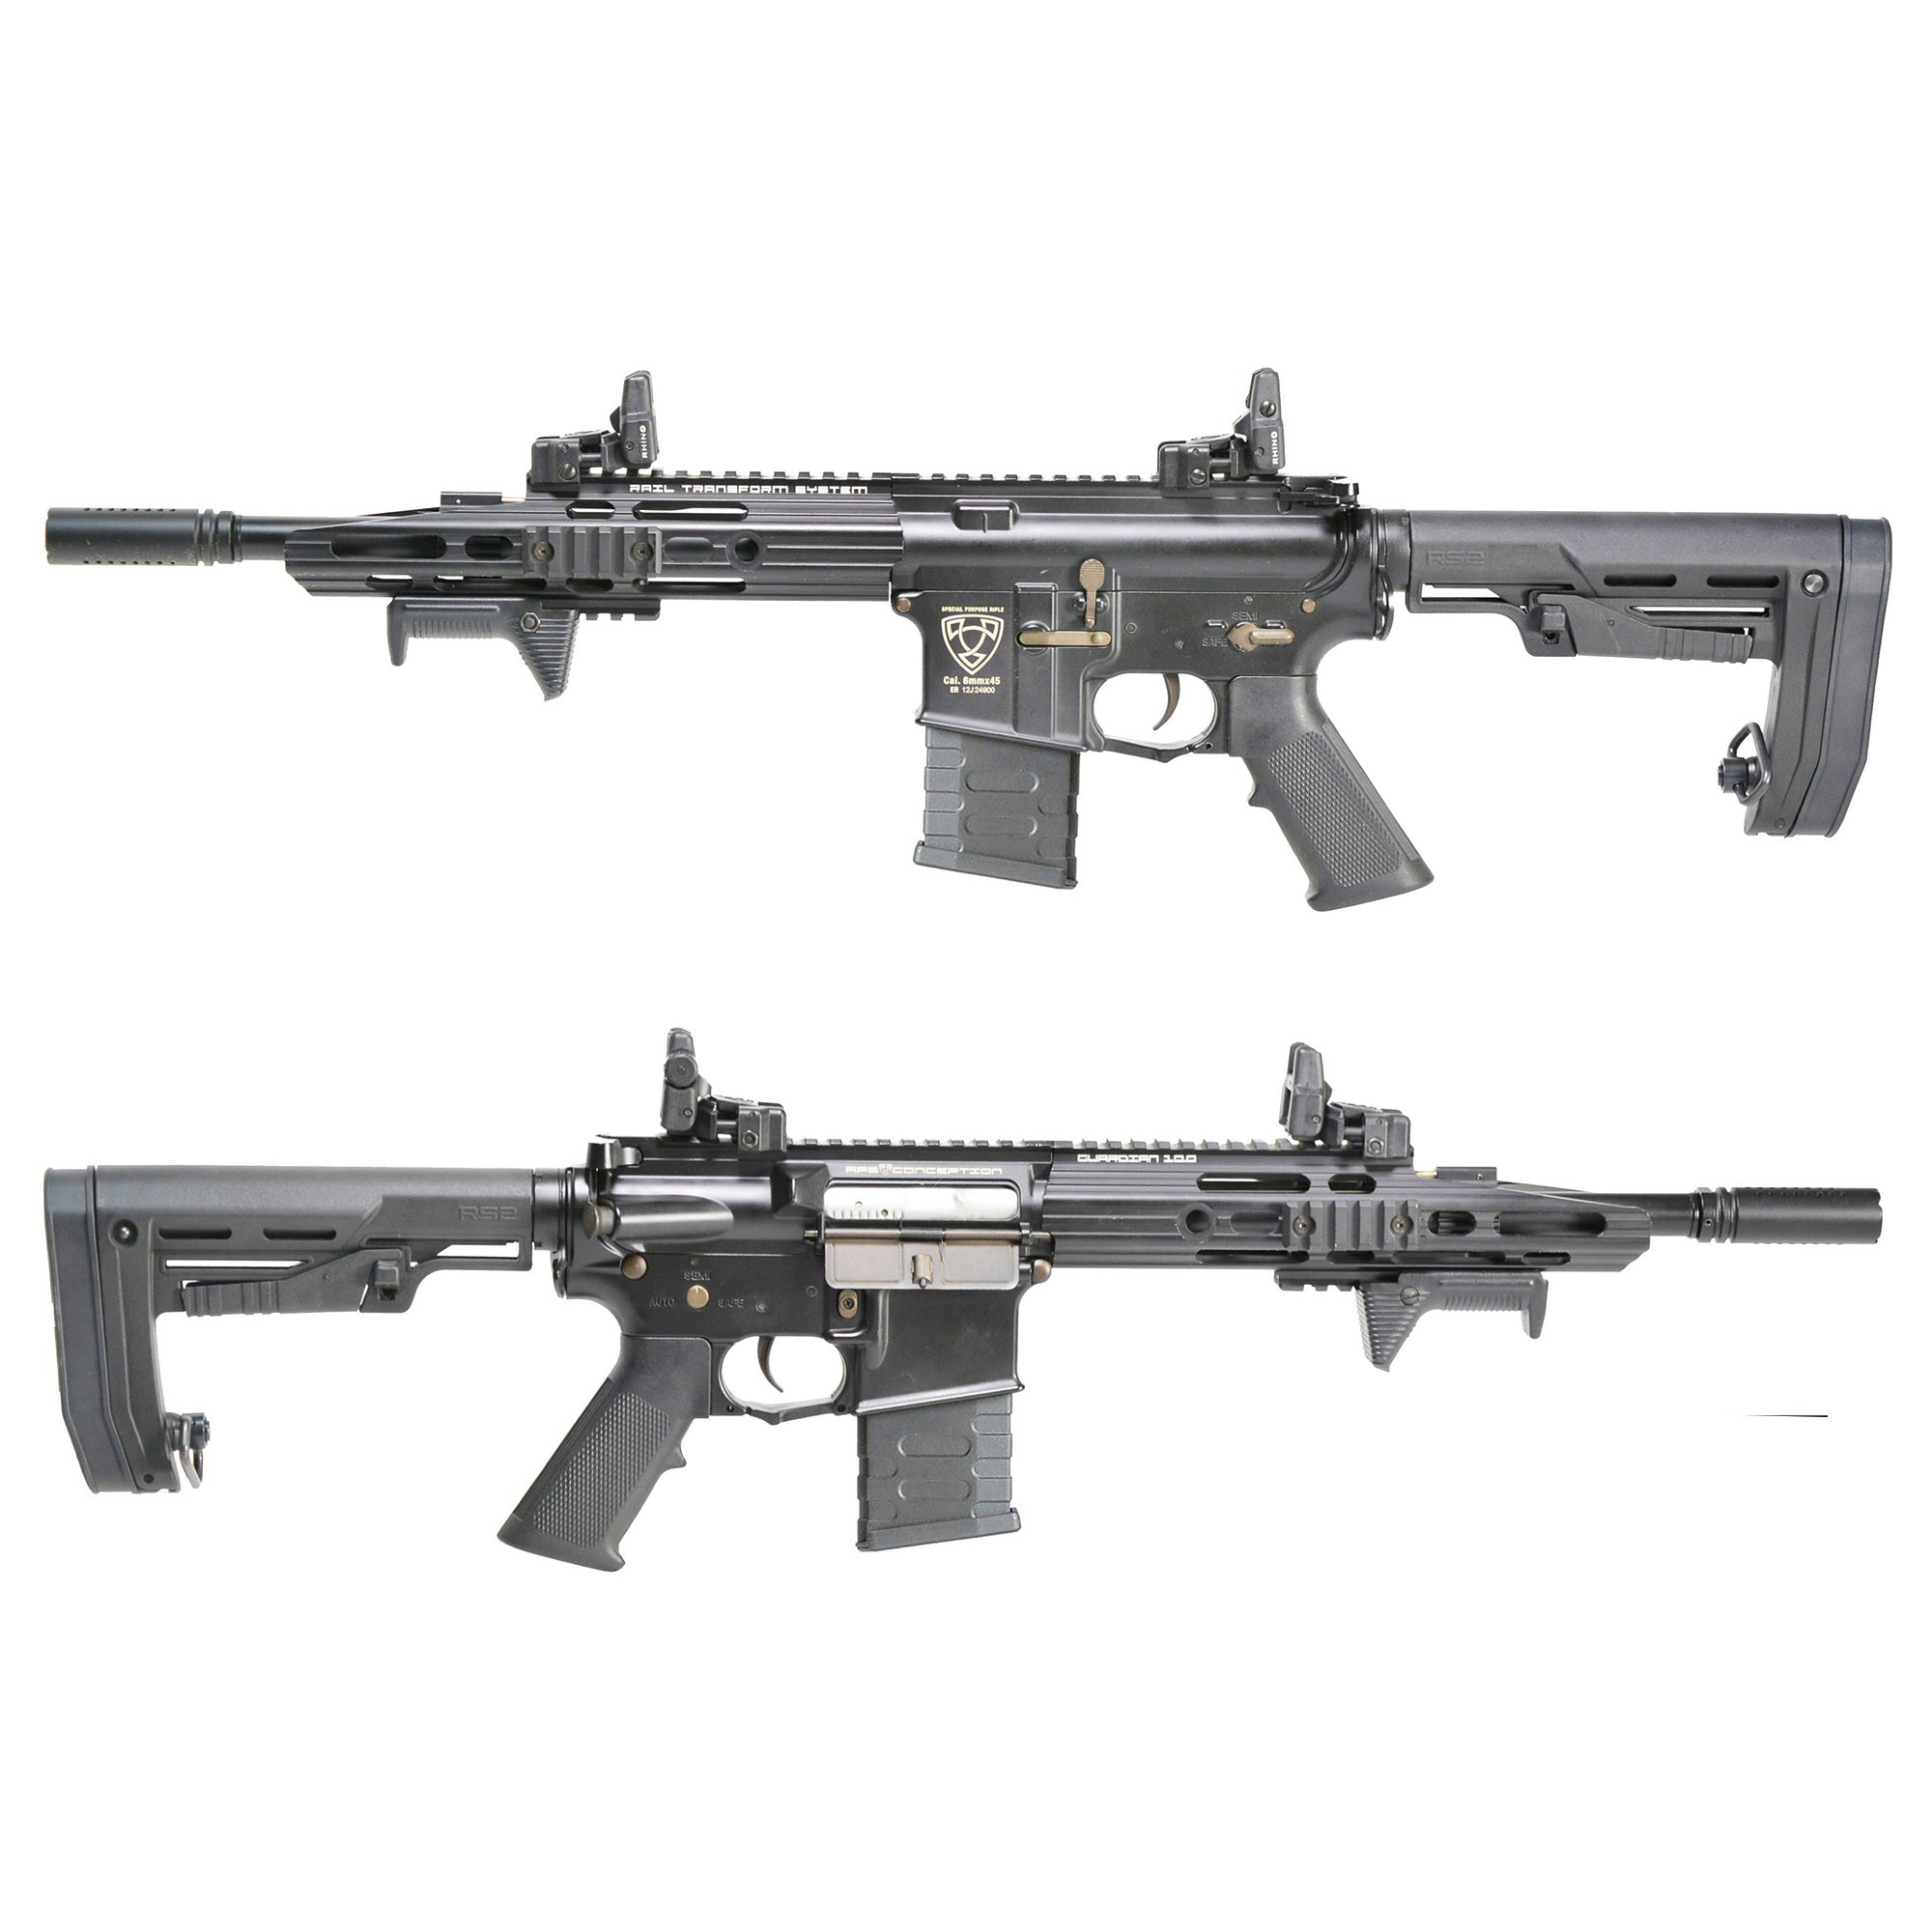 RIFLE DE AIRSOFT AEG M4 GUARDIAN TACTICAL STYLE FULL METAL BLOWBACK ASR111R2 - APS